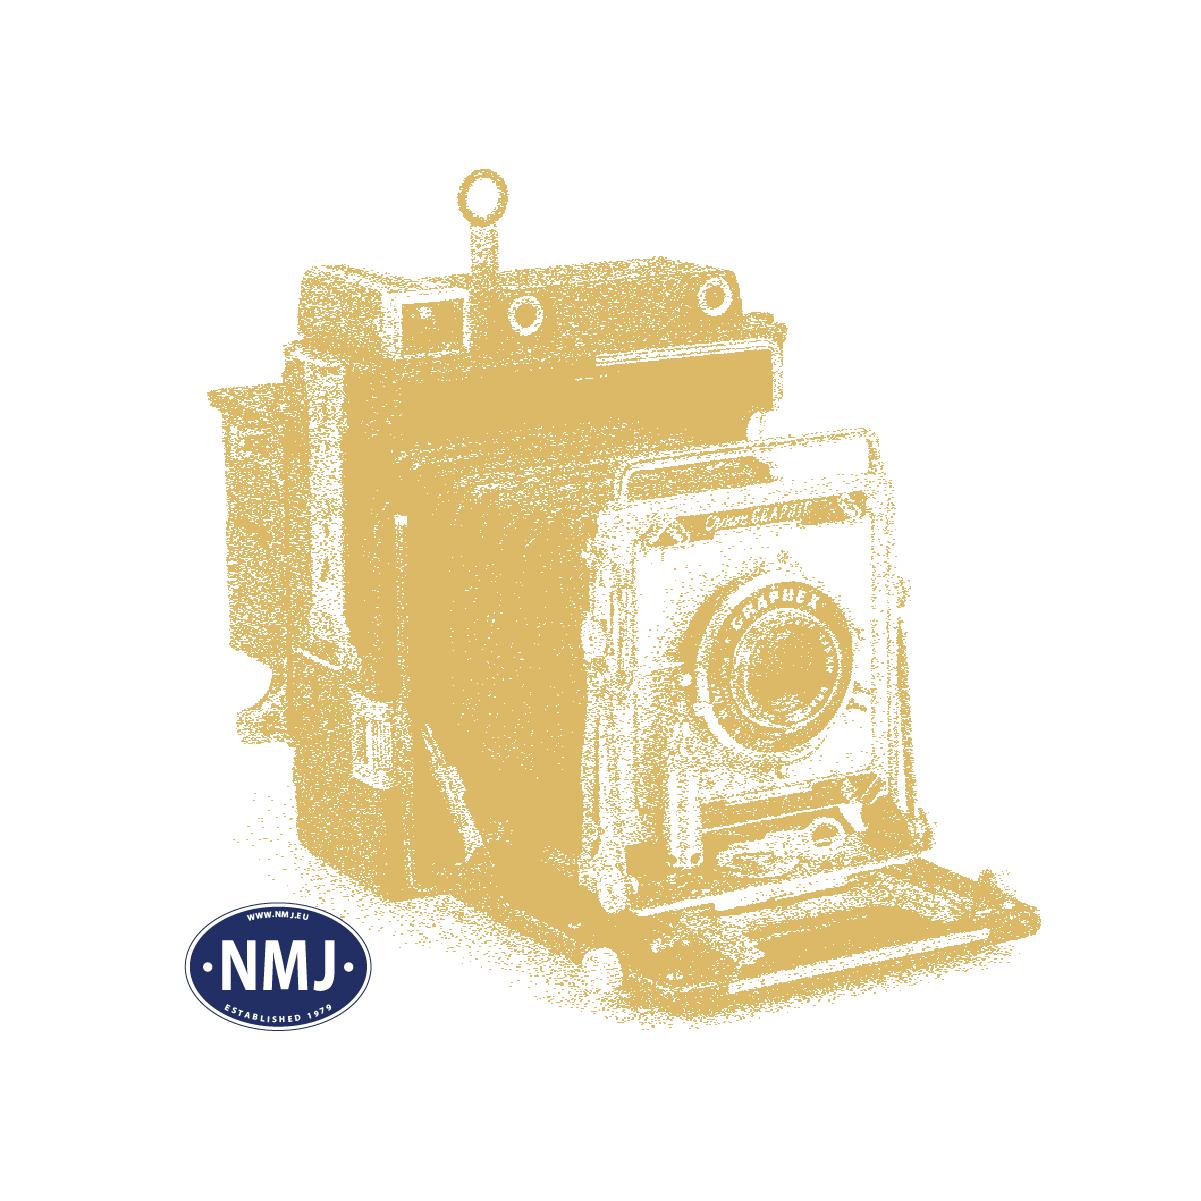 NMJT90302 - NMJ Topline CFL 1603 (1956-1971), DC